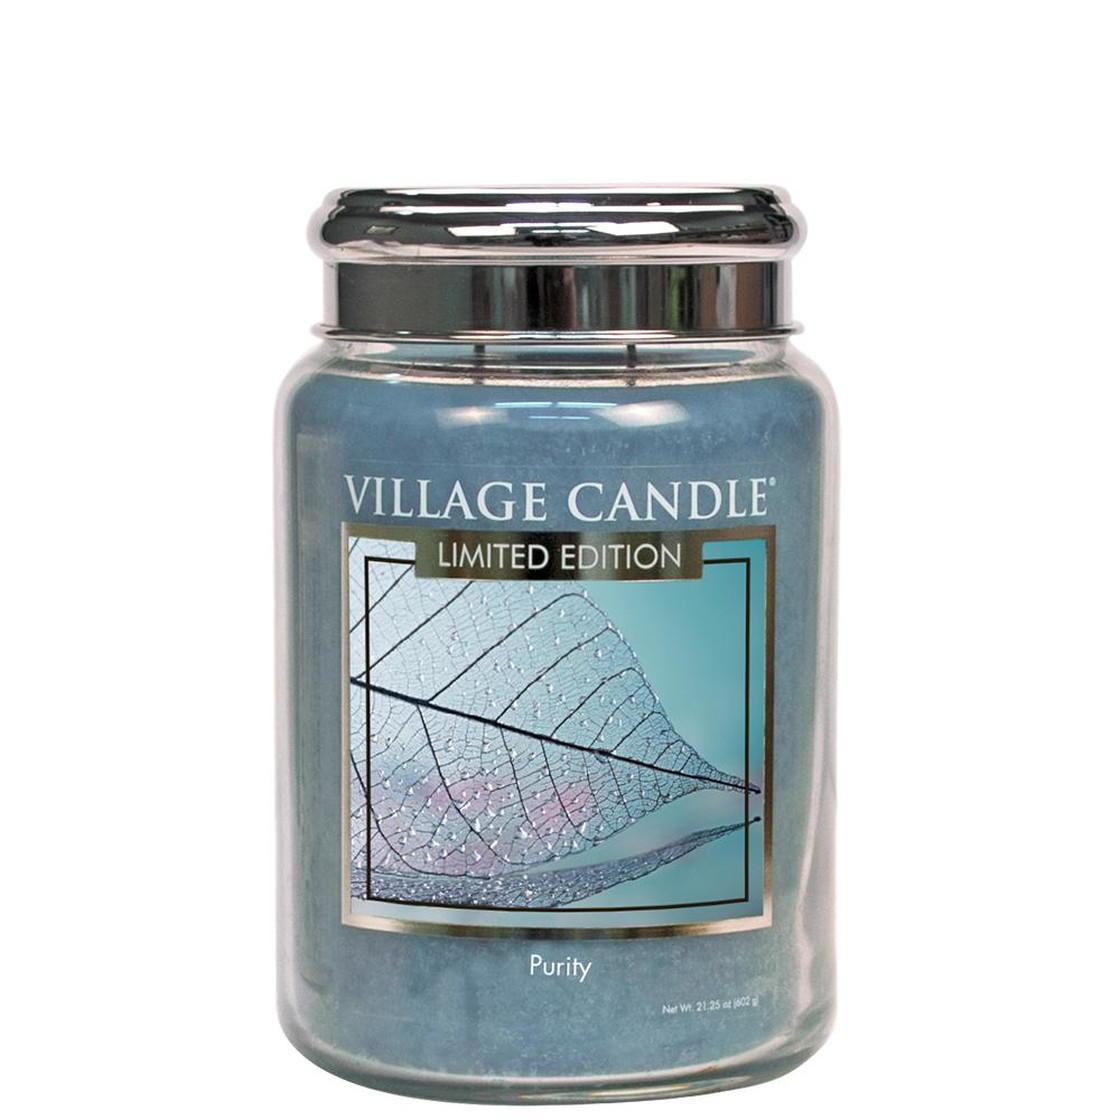 VILLAGE CANDLE Svíčka Village Candle - Purity 602g, modrá barva, sklo, kov